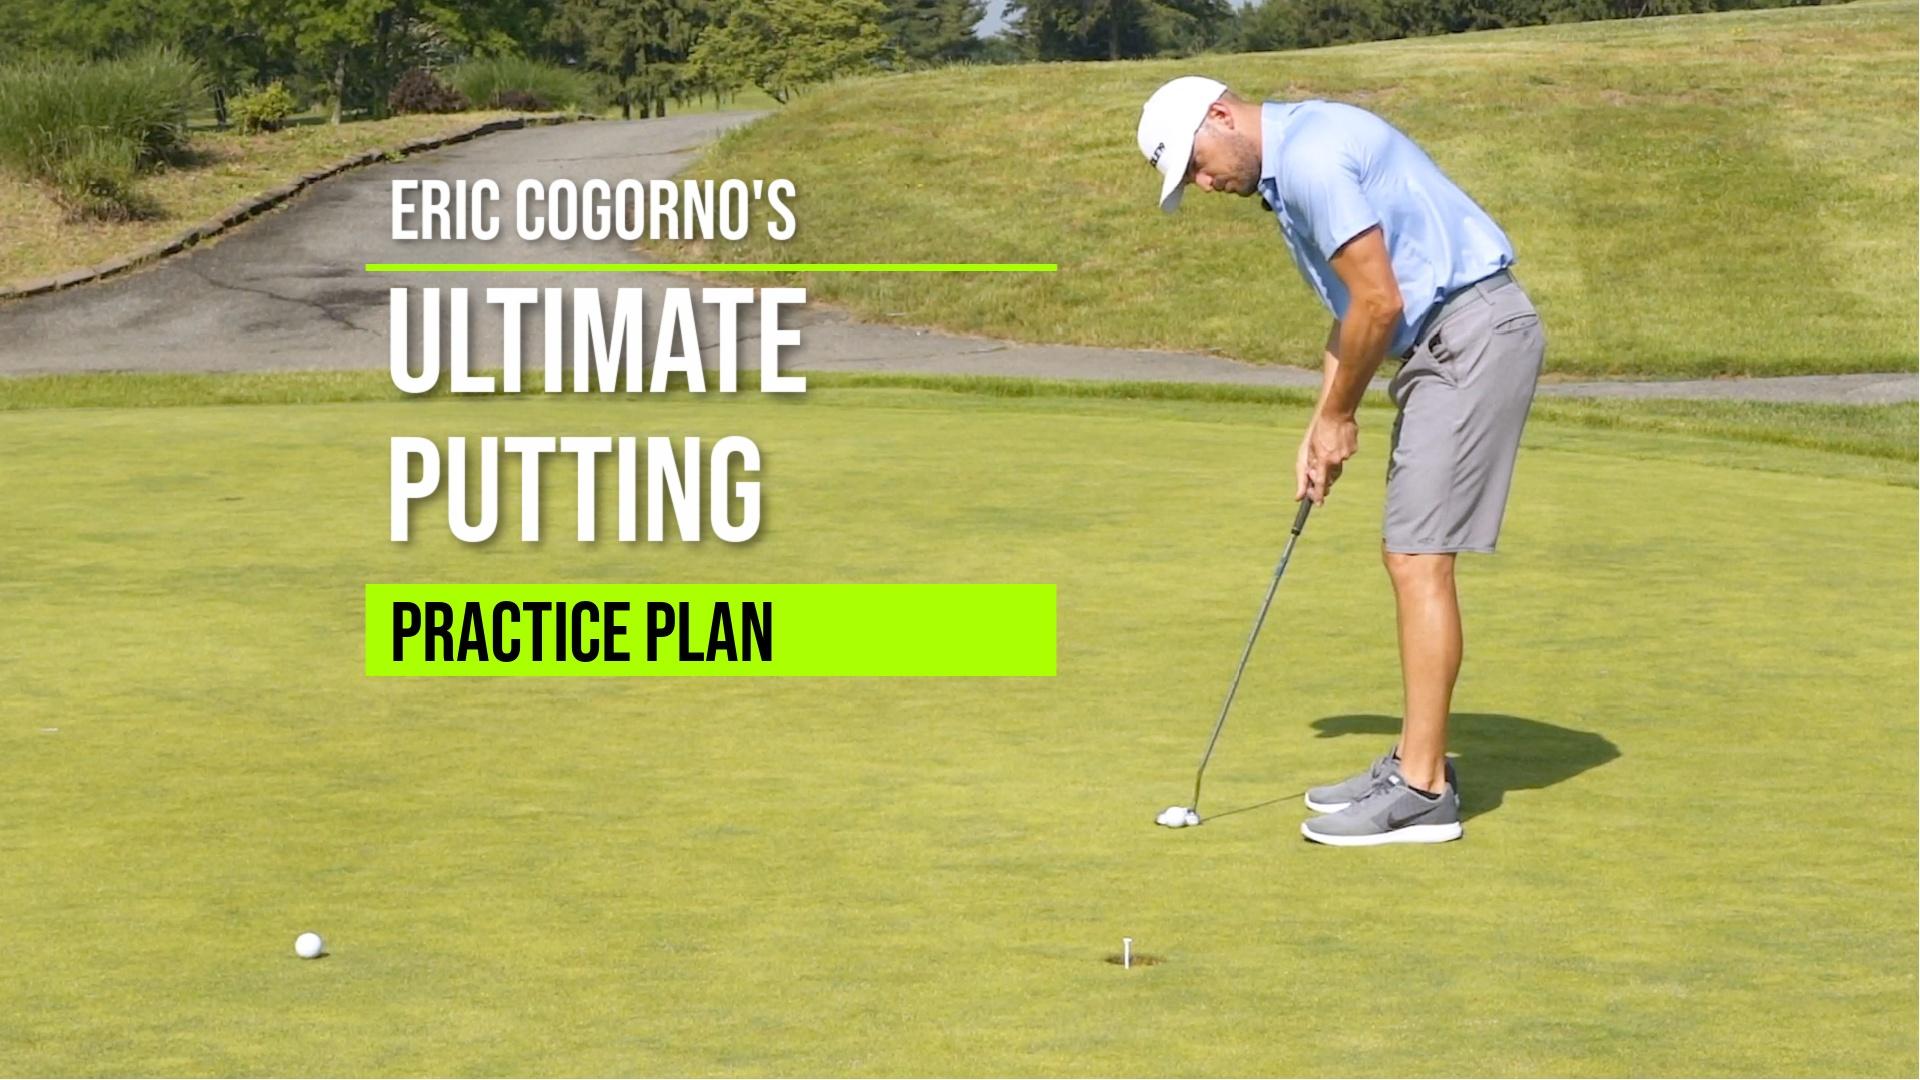 Eric Cogorno's Ultimate Putting Practice Plan